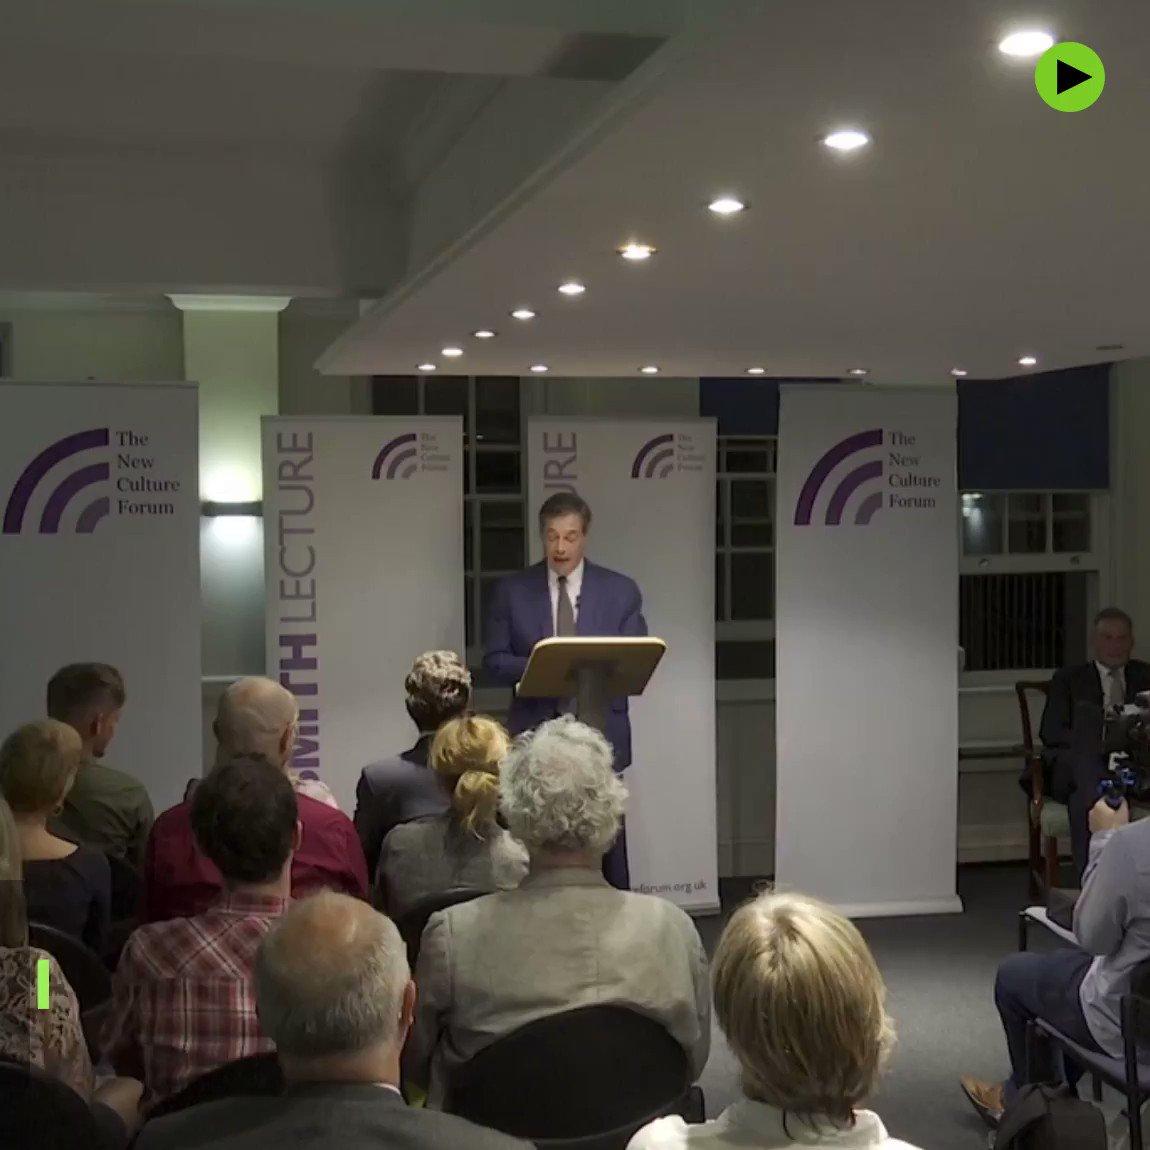 'Social Media is threatening democracy' – Former UKIP leader Nigel Farage https://t.co/RsBBo3TcRX